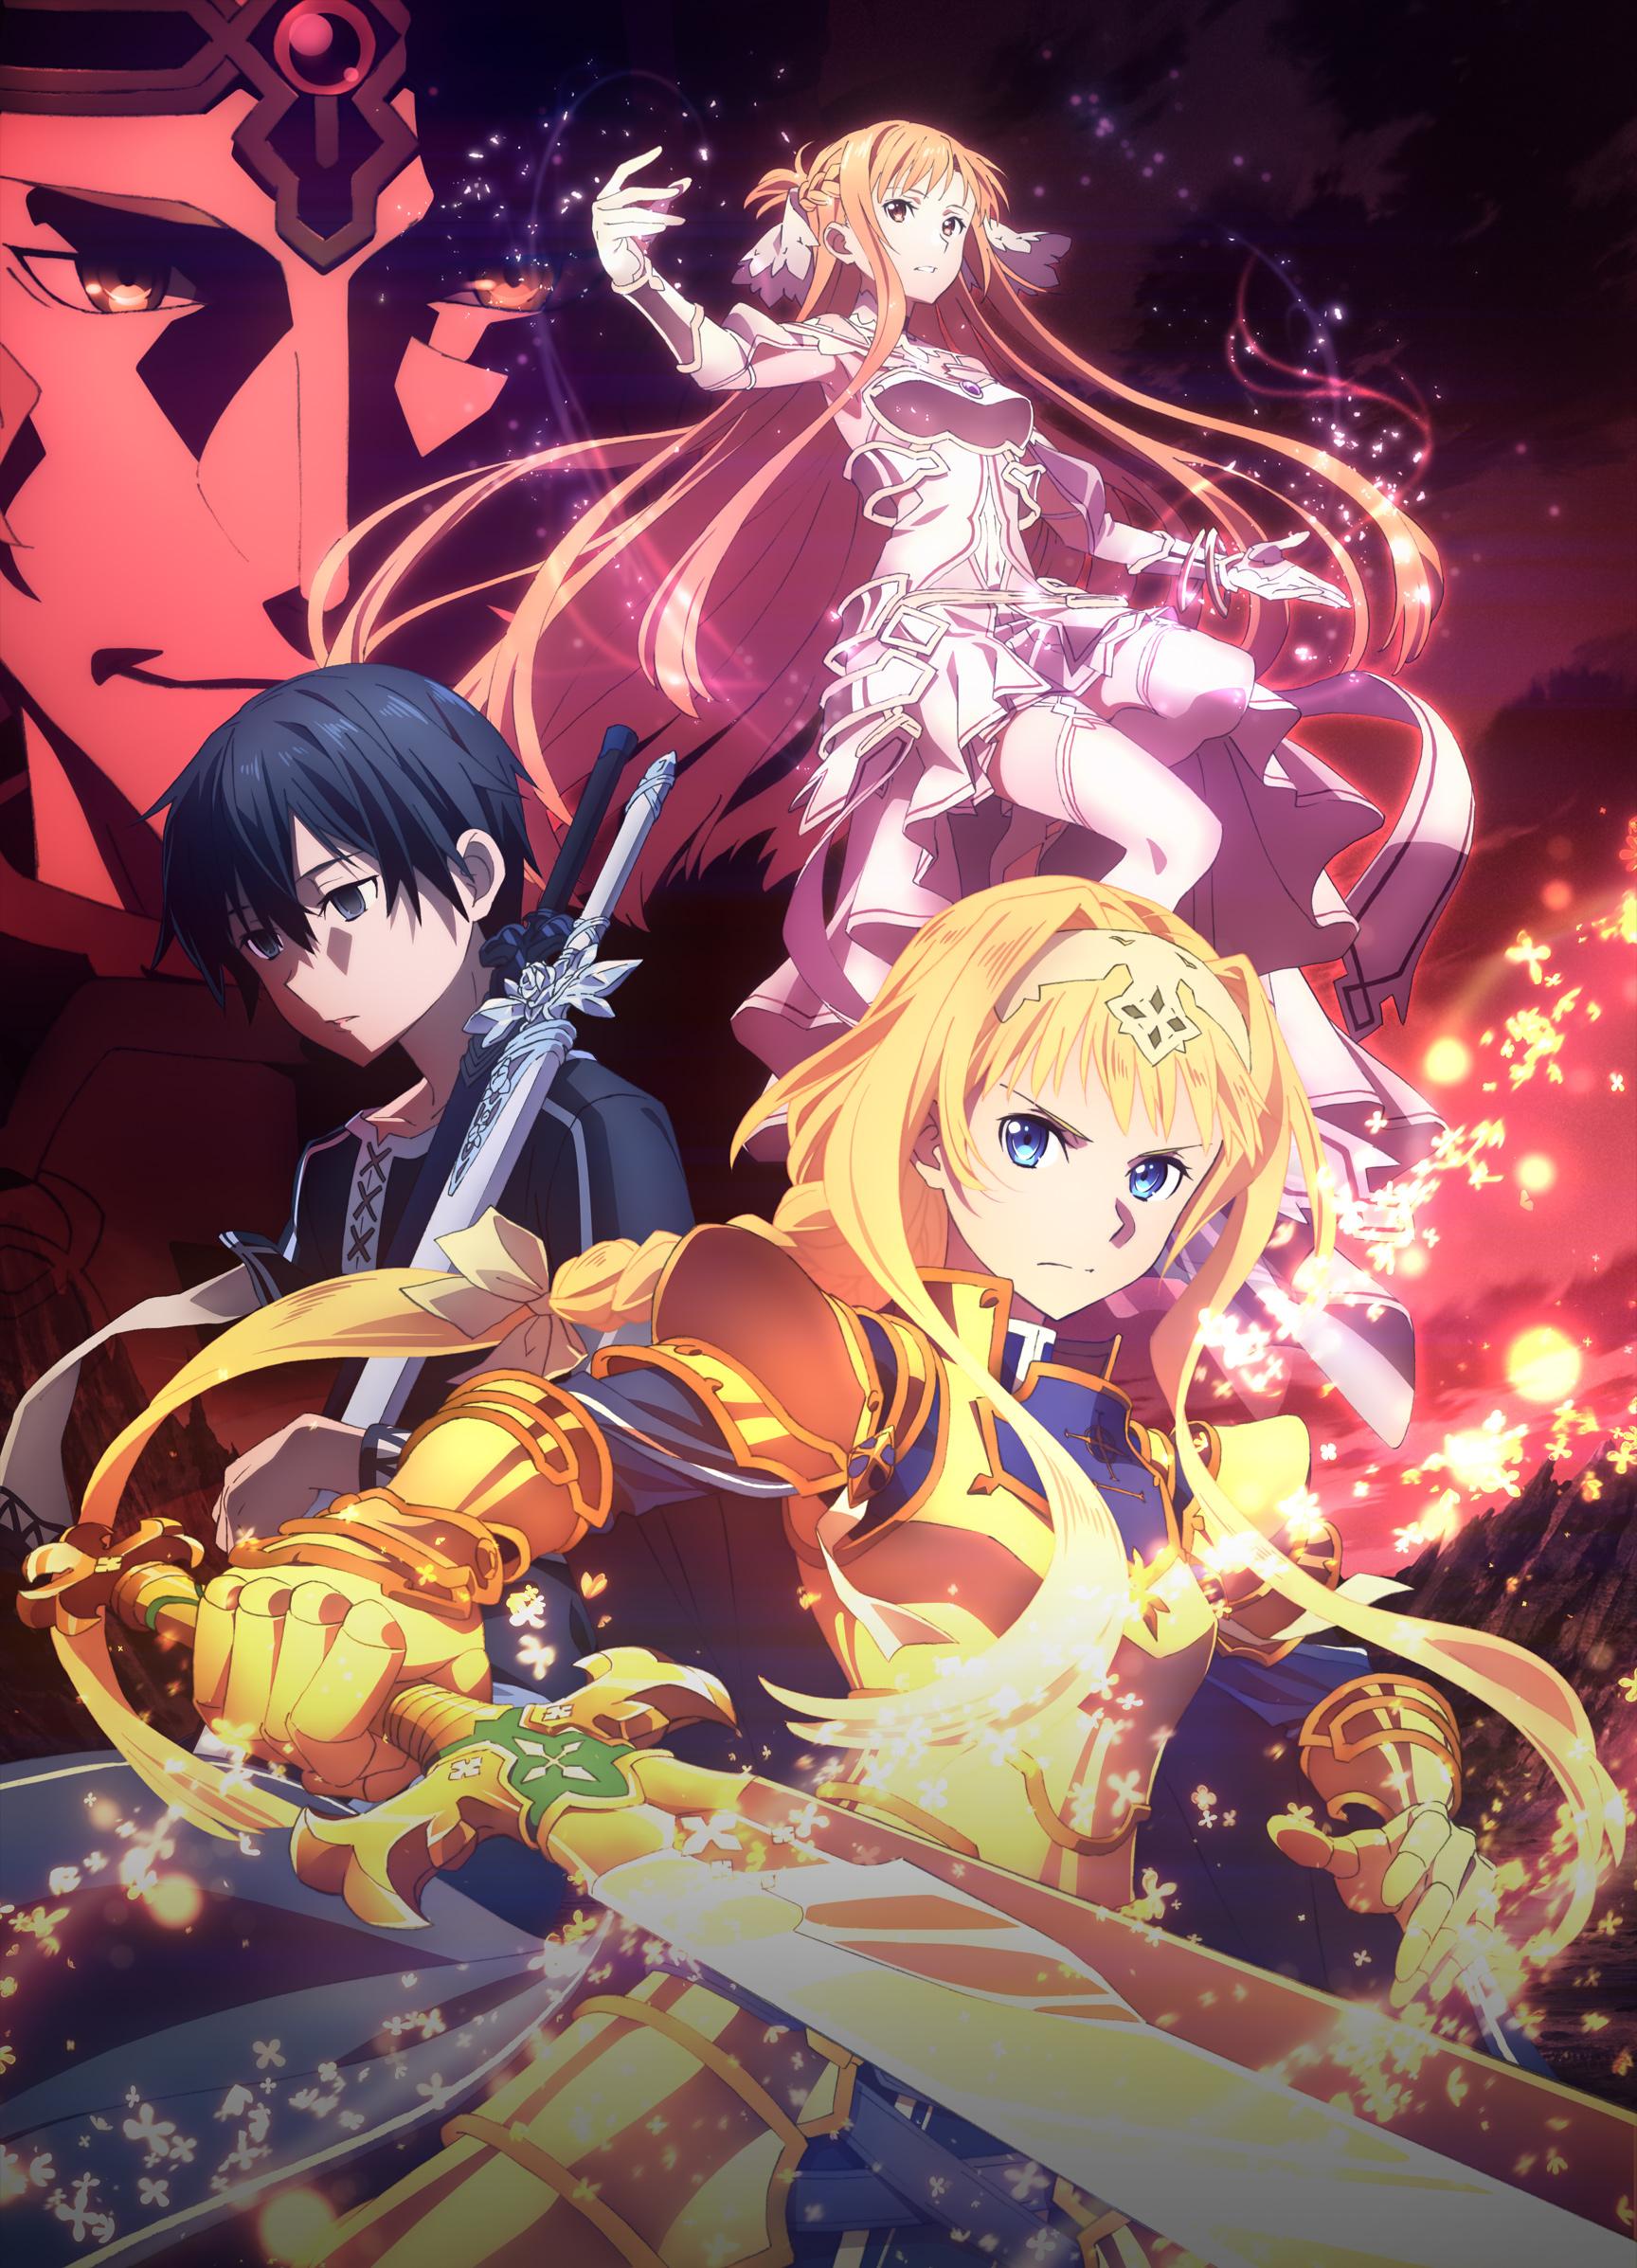 Sword Art Online Ordinal Scale Stream Vostfr : sword, online, ordinal, scale, stream, vostfr, Watch, Sword, Online, Action/Adventure,, Fantasy,, Romance, Anime, Funimation